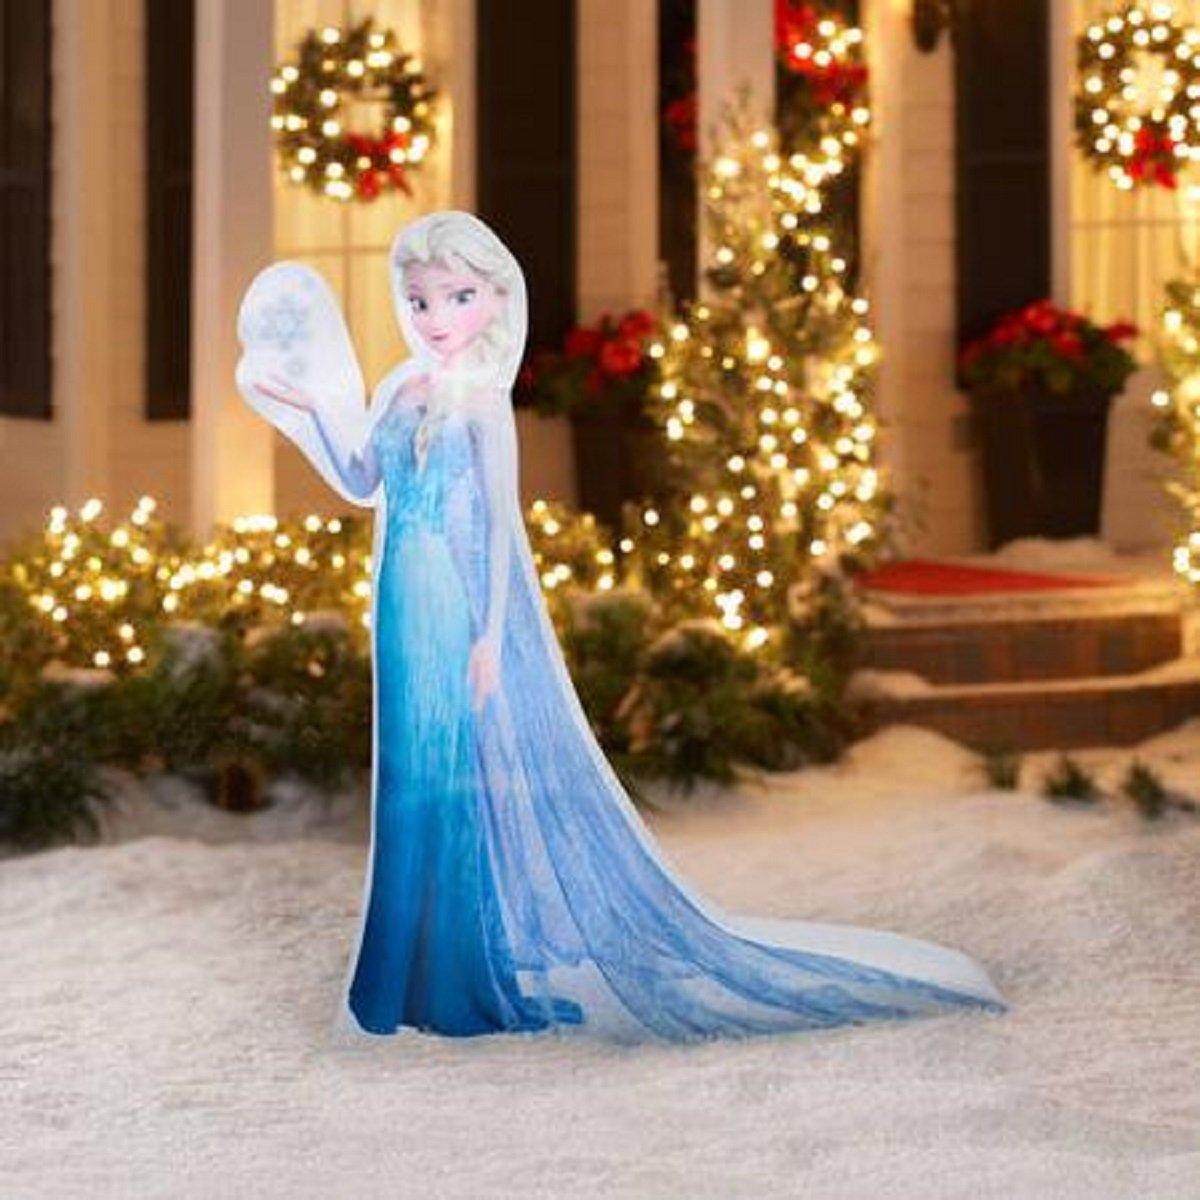 Amazon.com: Christmas Inflatable 5' LED Photoreal Elsa Disney ...